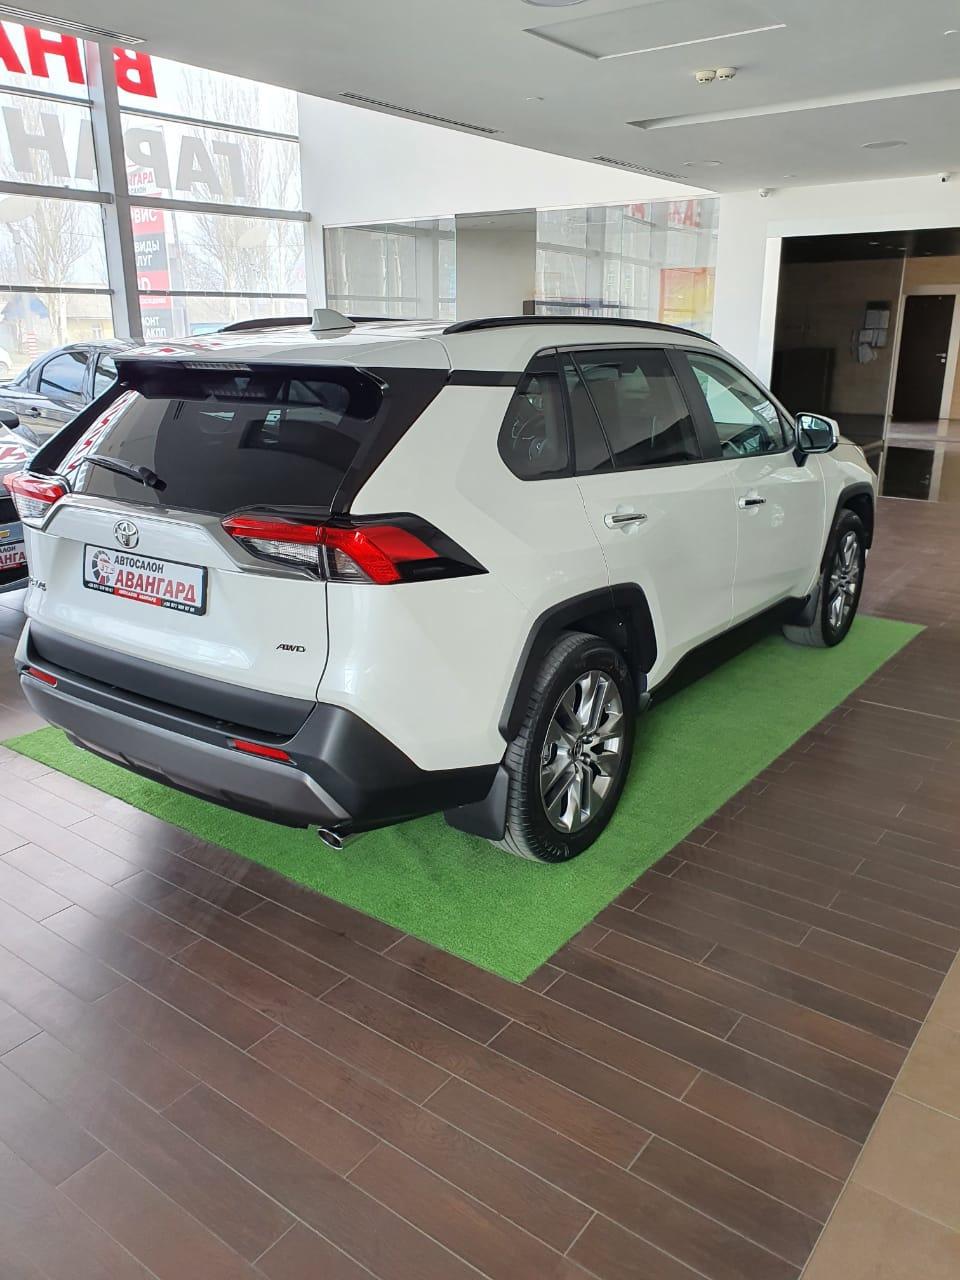 Toyota RAV4 2.5 199 л.с. 8АКП. Комплектации Prestige Safety 2021 года выпуска, цвет белый перламутр.